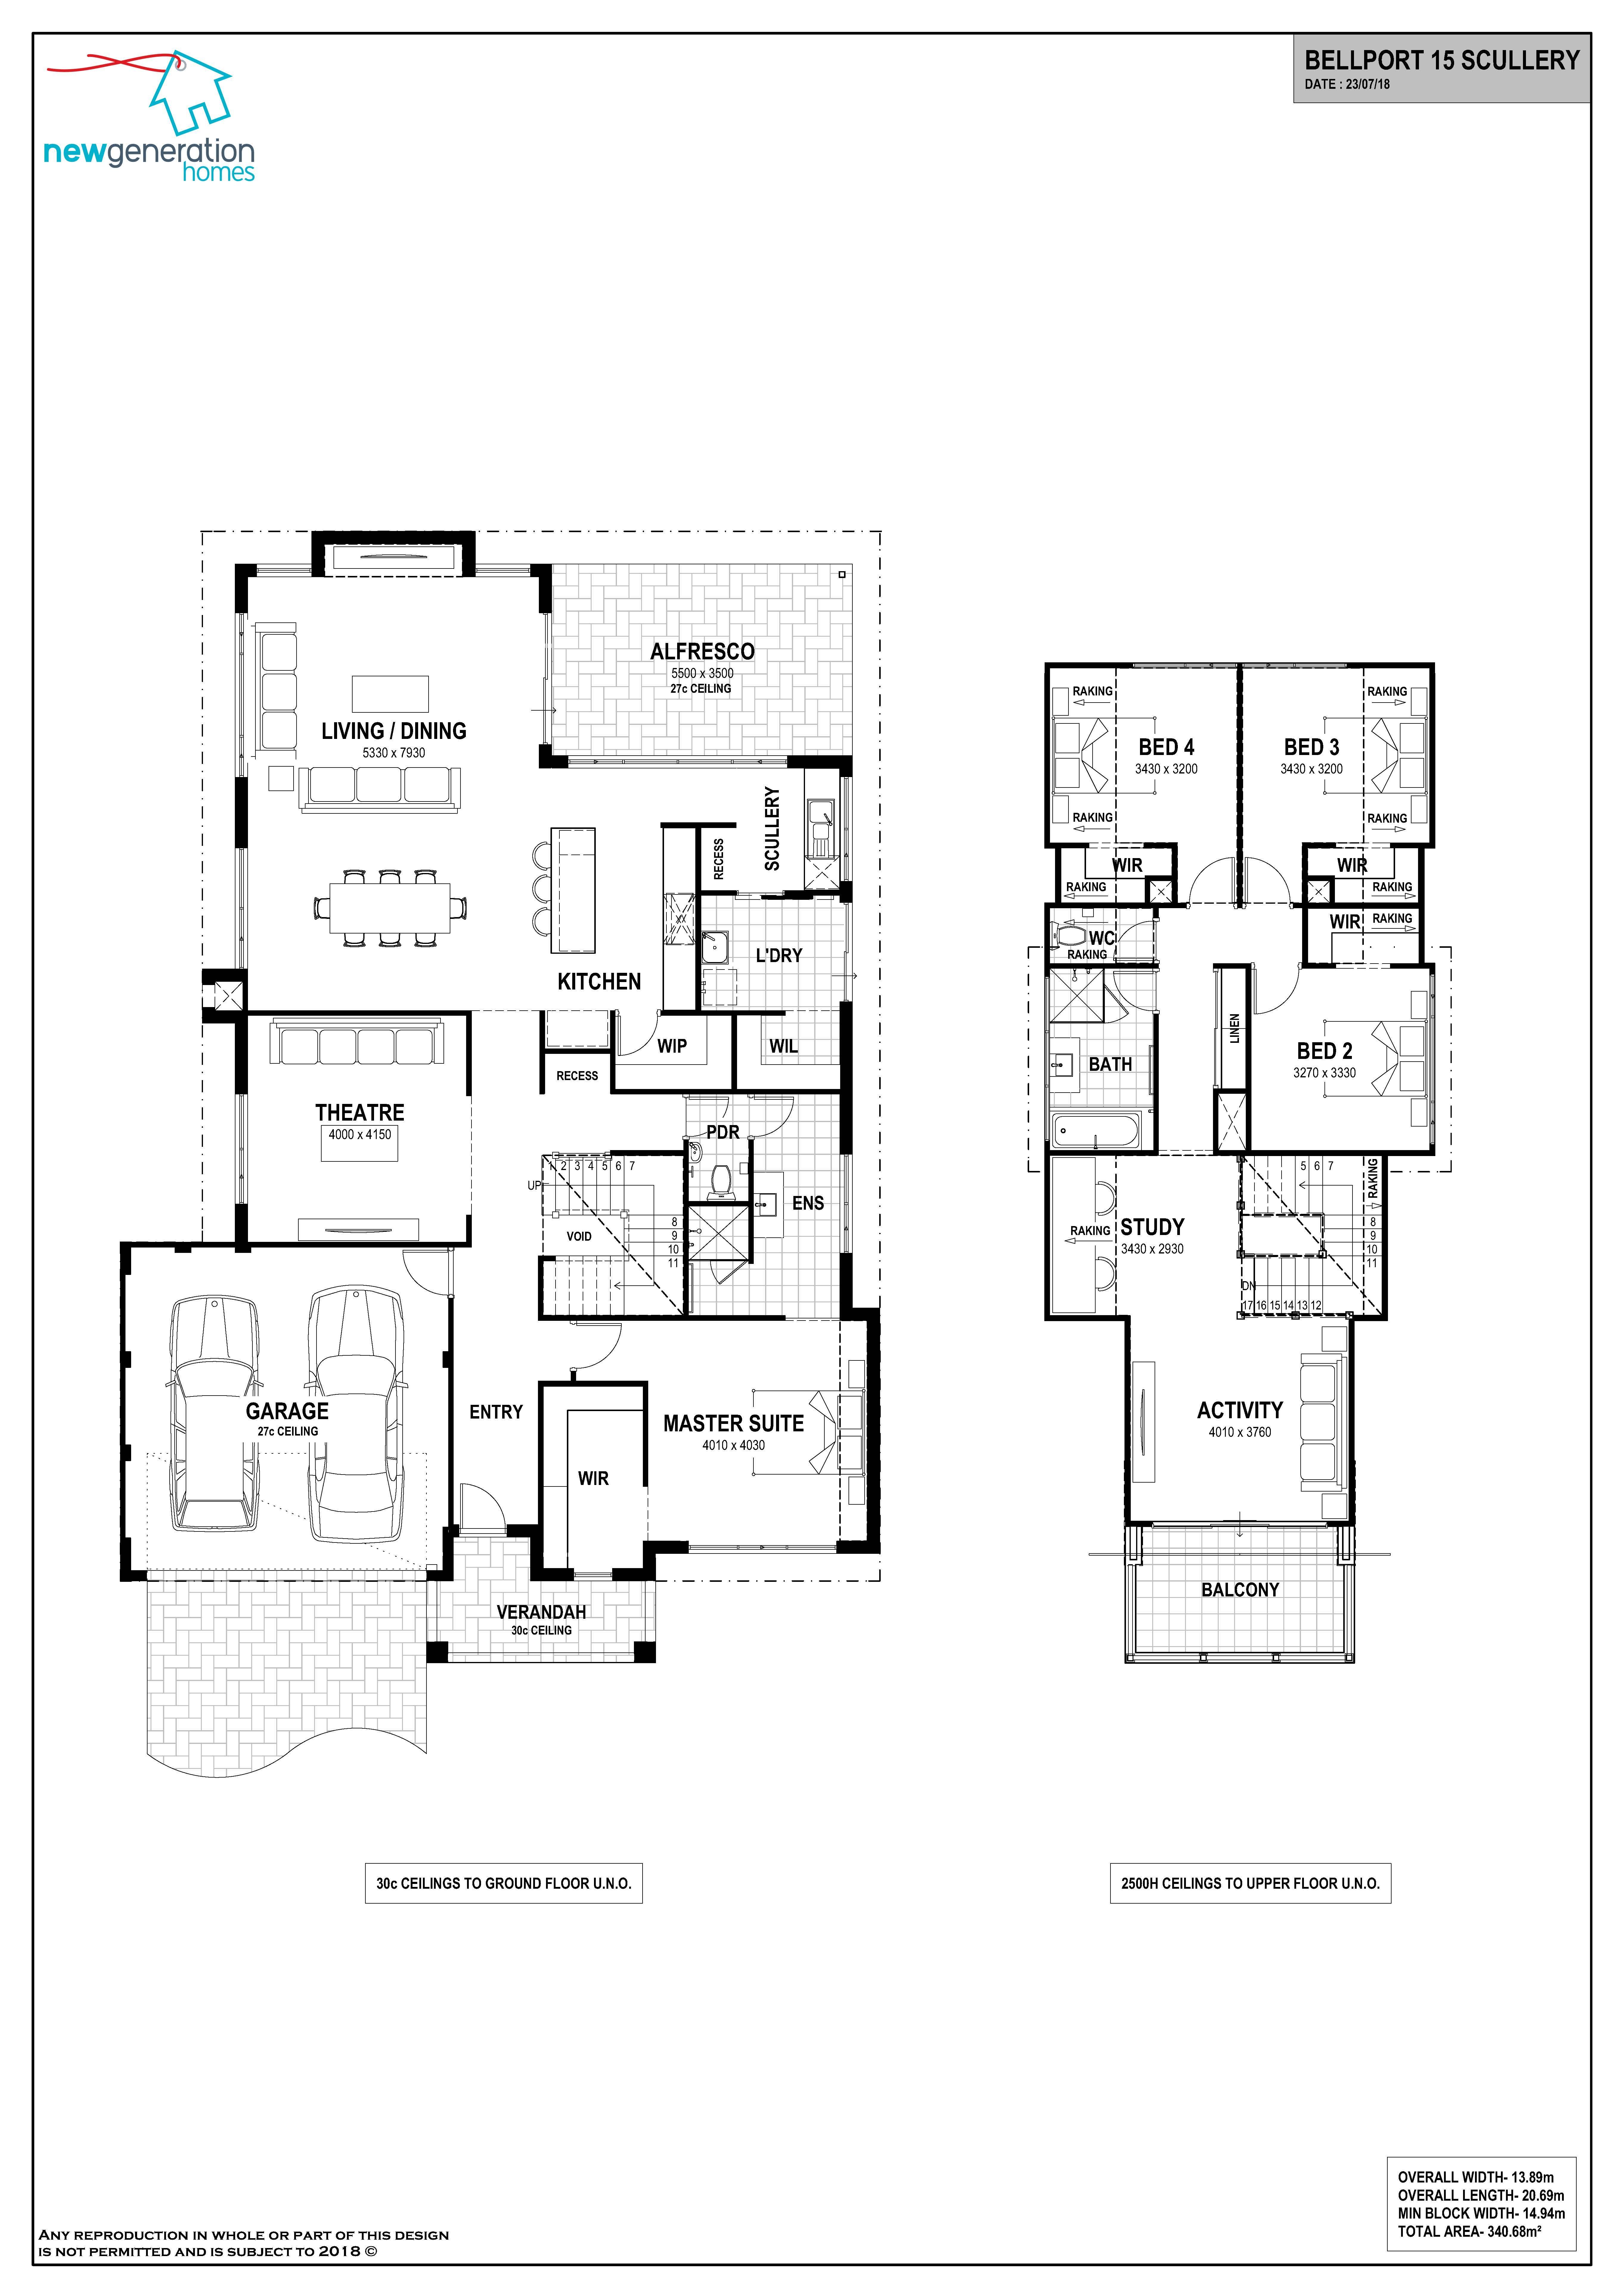 Loft Homes Perth House Plans Perth Bellport 15 Scullery